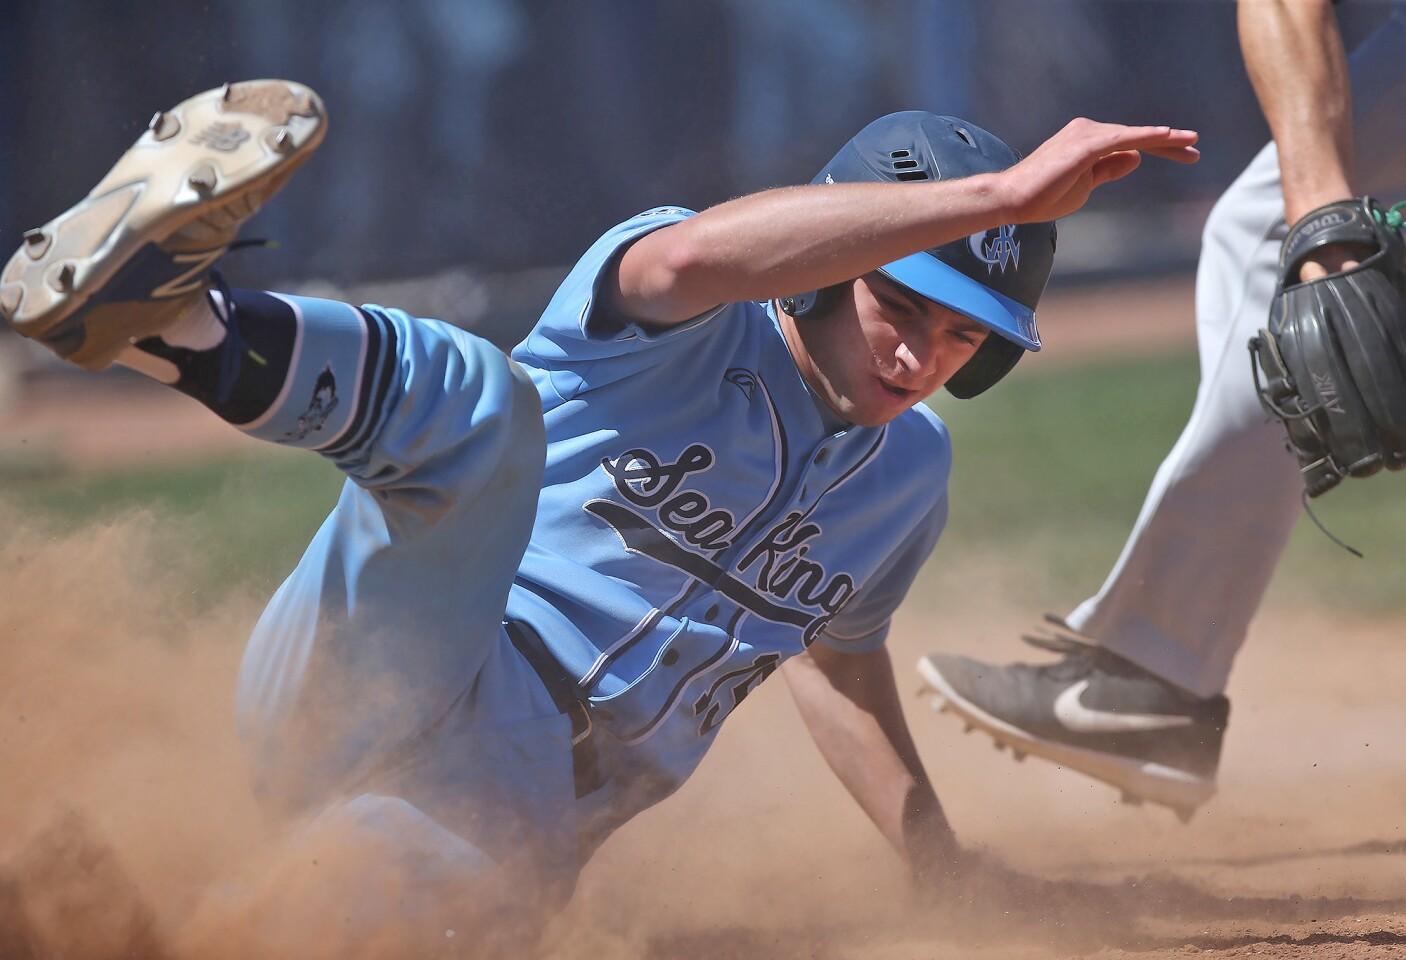 Photo Gallery: Costa Mesa vs. Corona del Mar in baseball